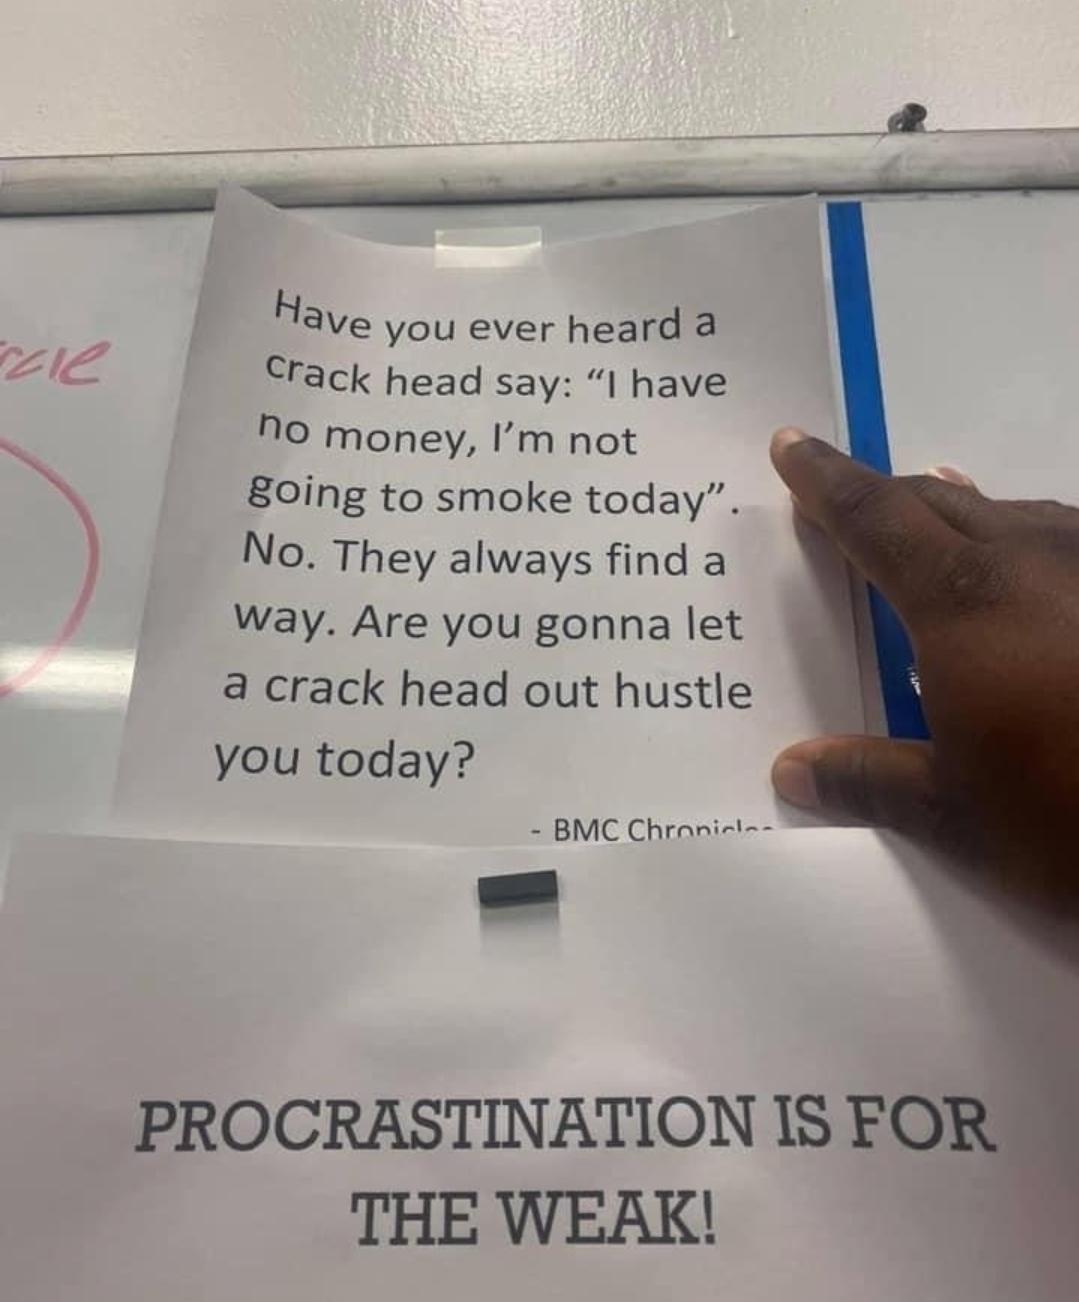 [image] Procrastination is for the weak!